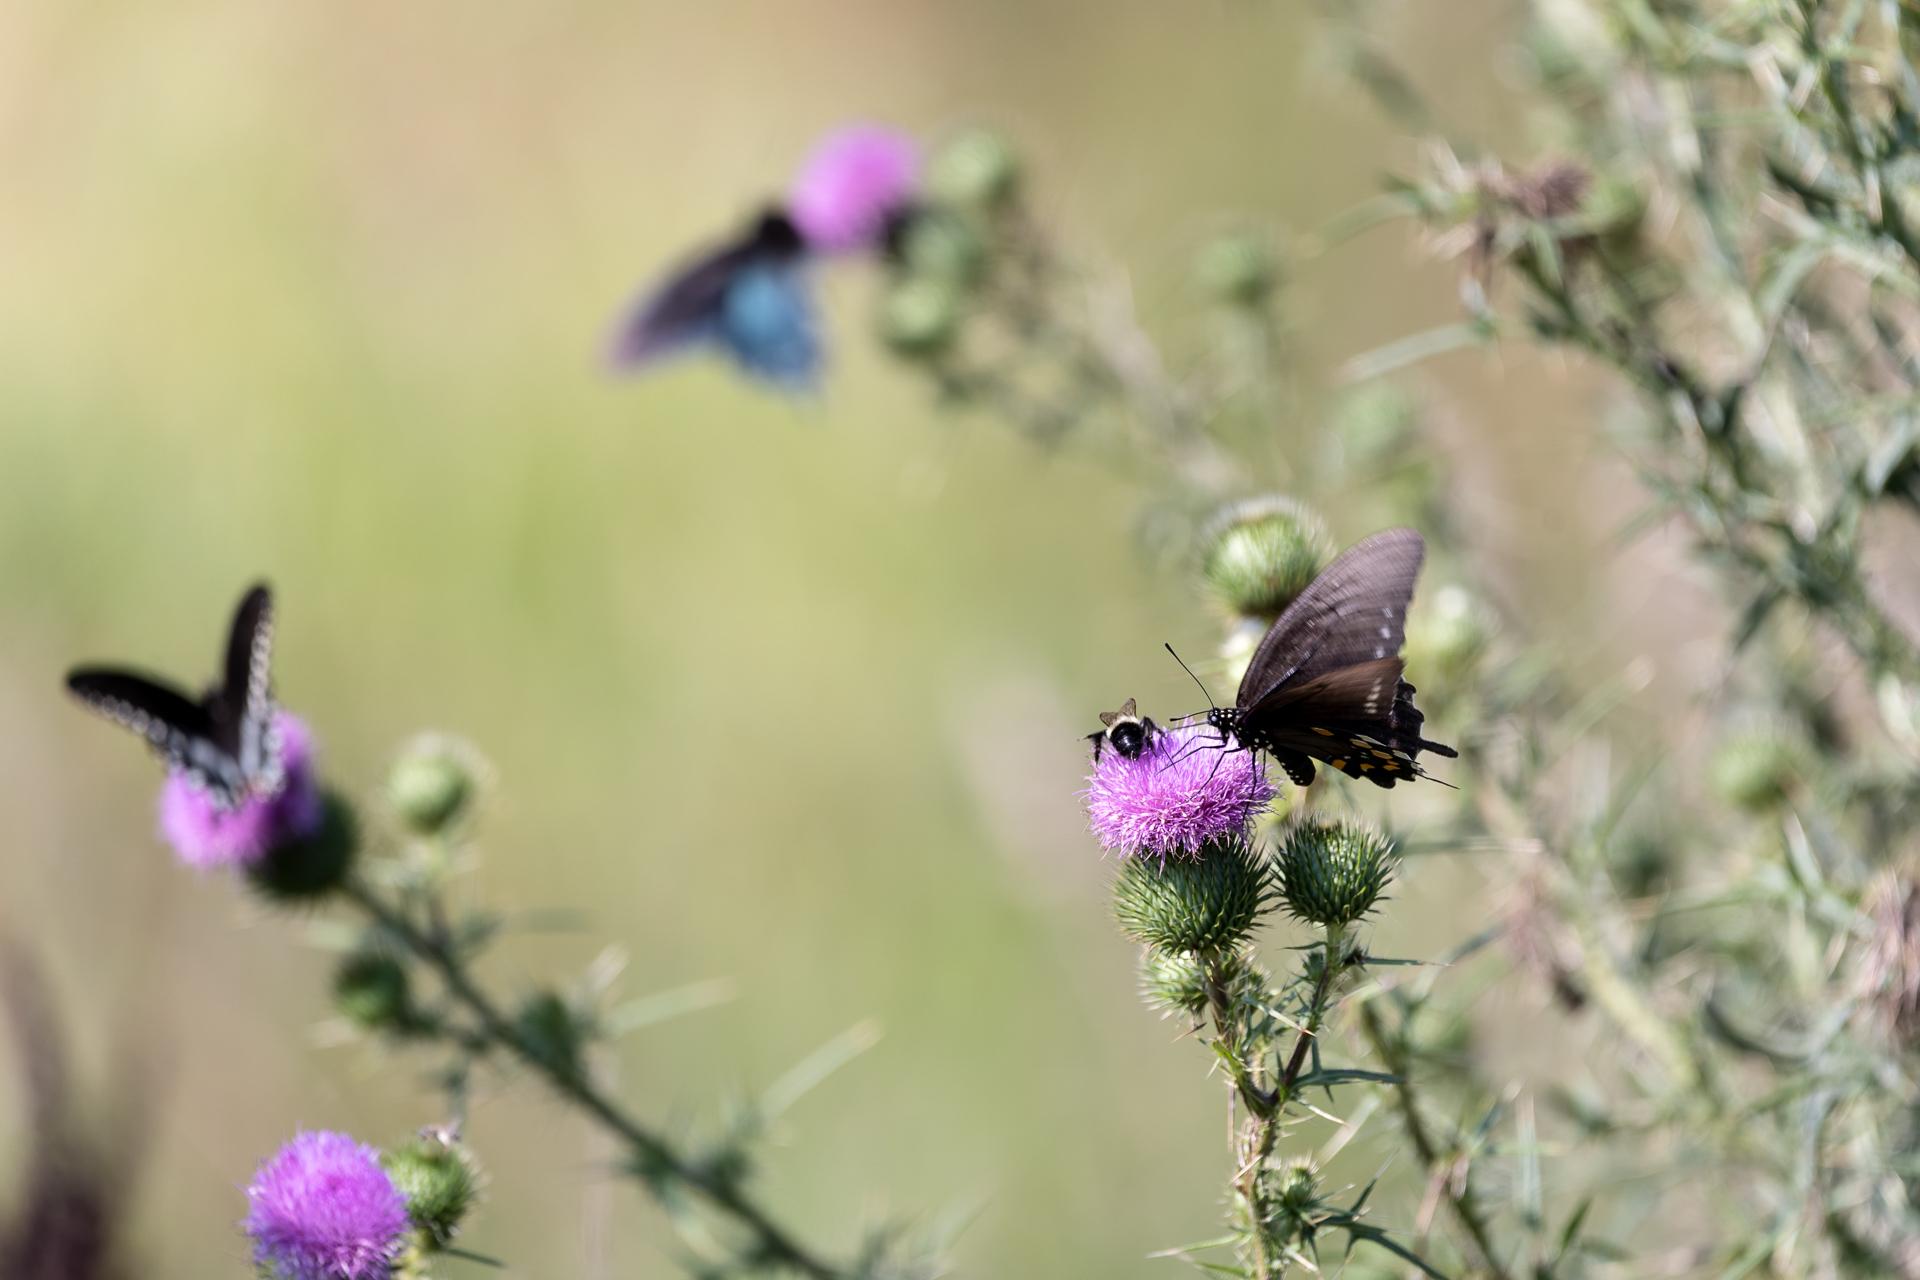 Butterflies-nature-Kathleen-Kathy-Roberts-Asheville-NC-Photographer-4.jpg